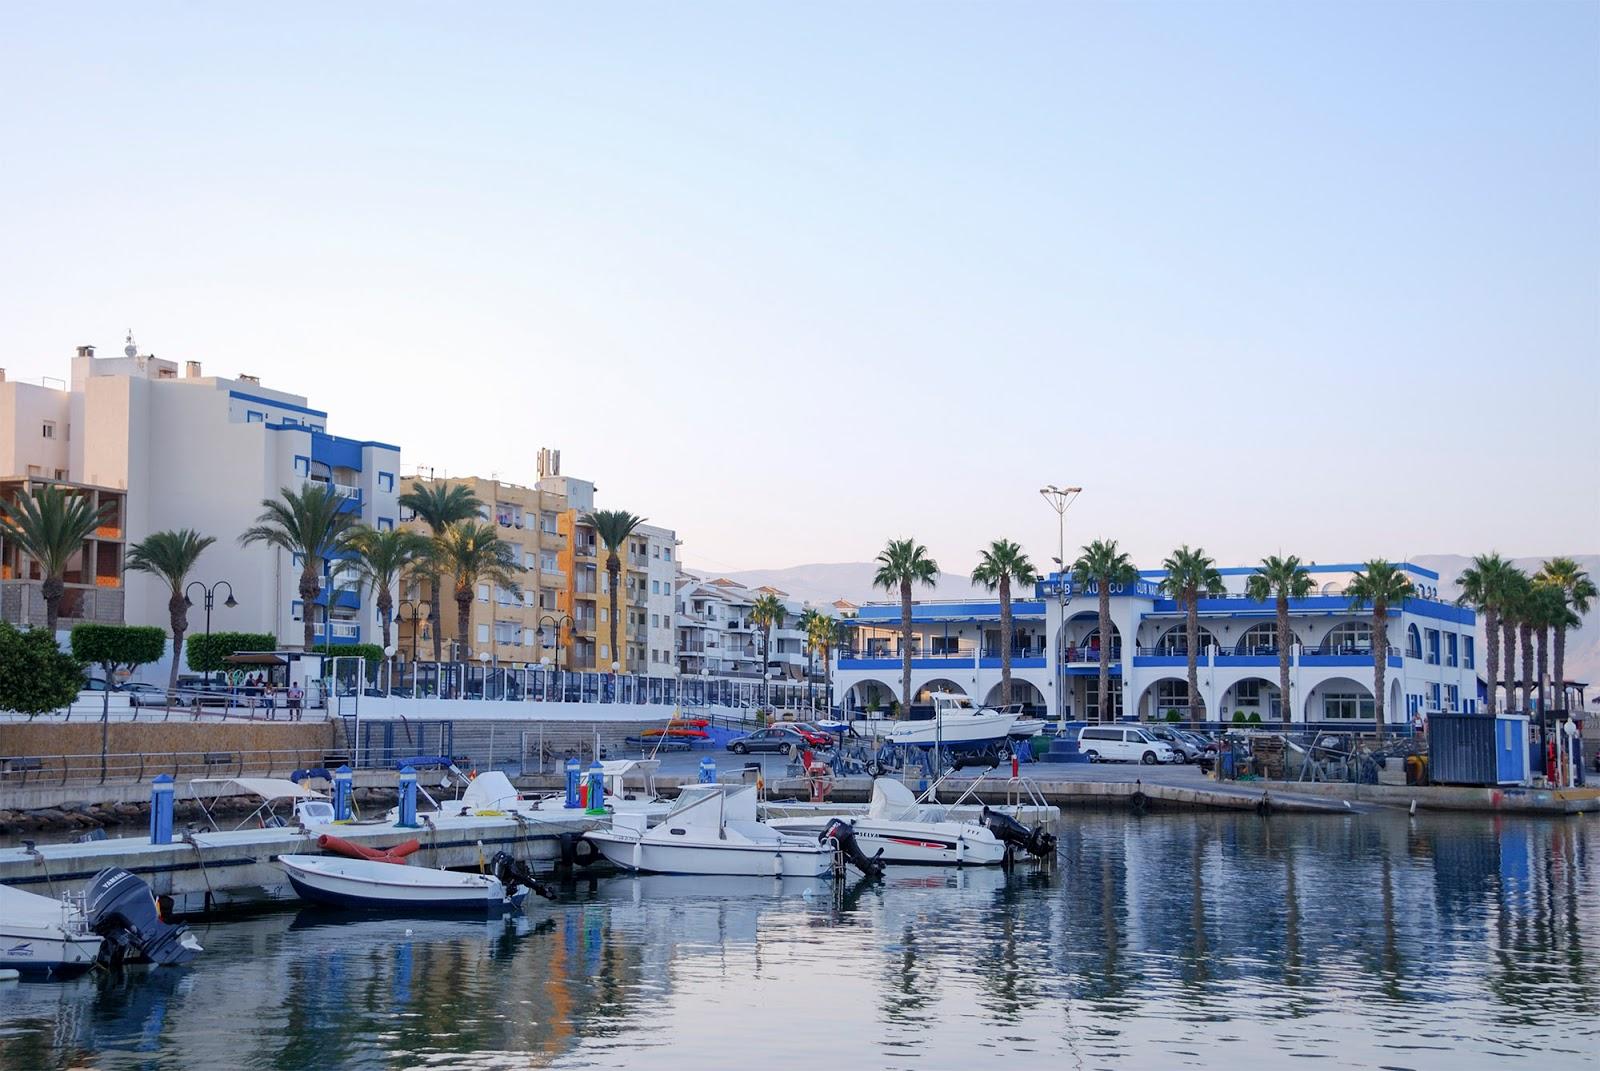 almeria beach spain roquetas mar coast port marina